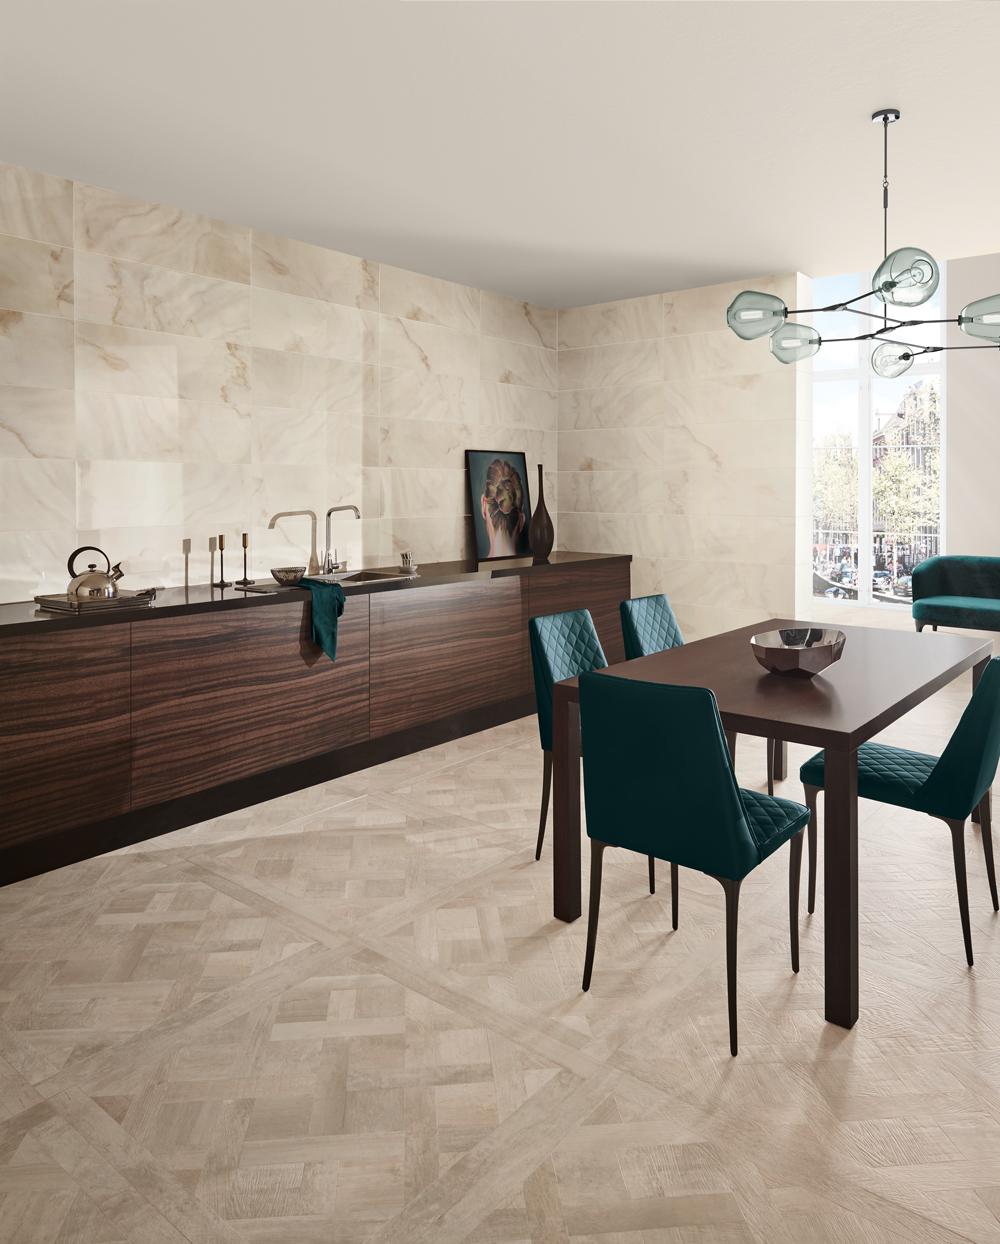 Bianco-Oro-Vintage-Cozinha-Amb01-1.jpg